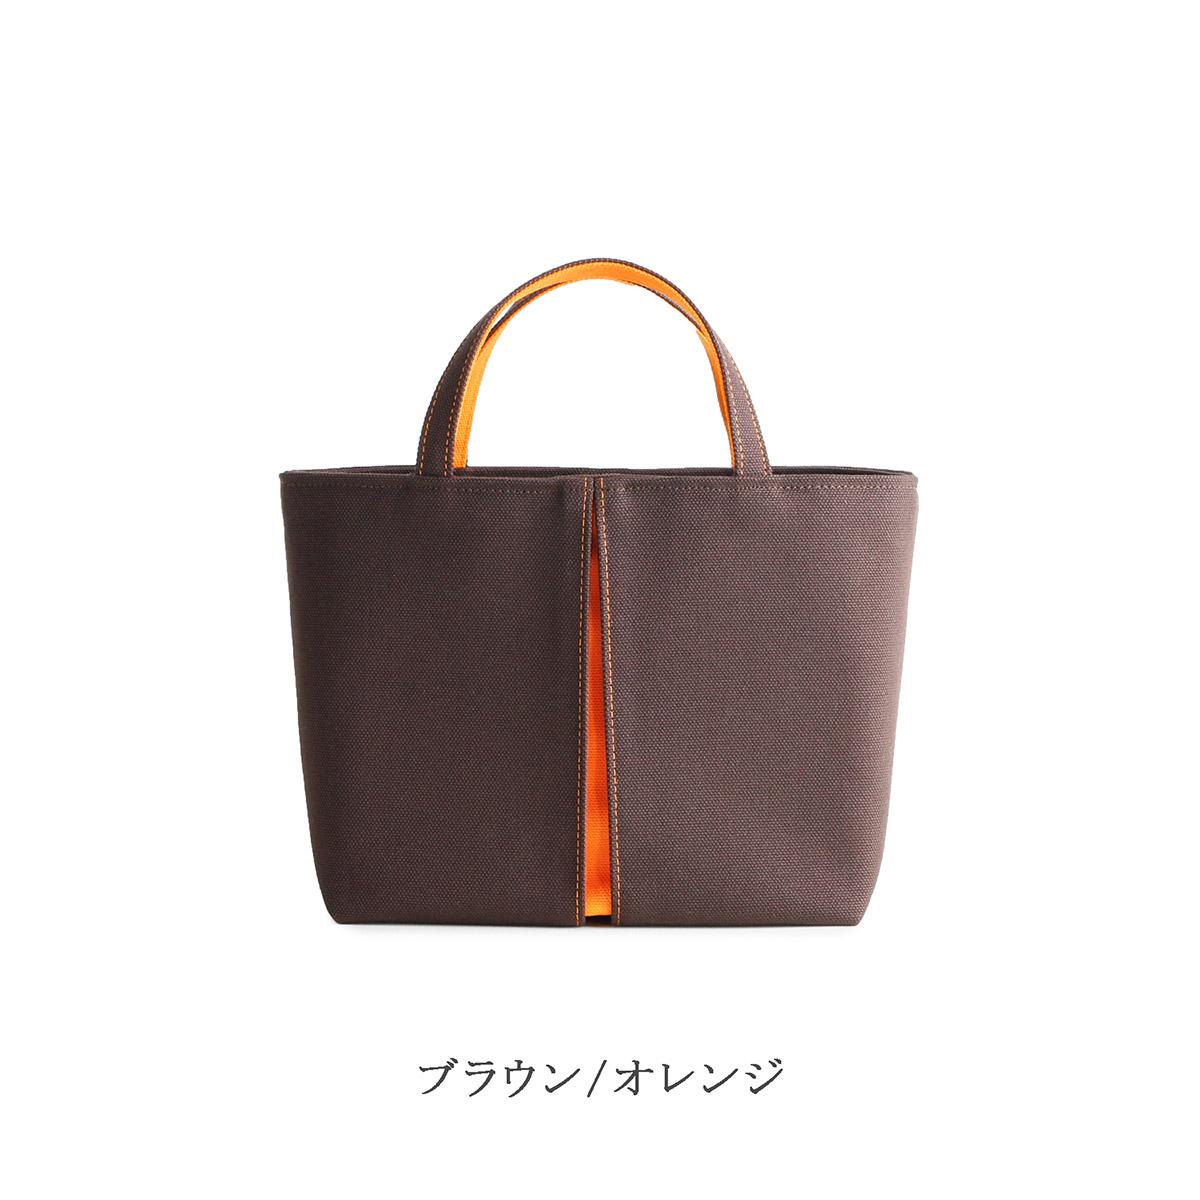 KOSHO ougi pleats トートバッグ YS